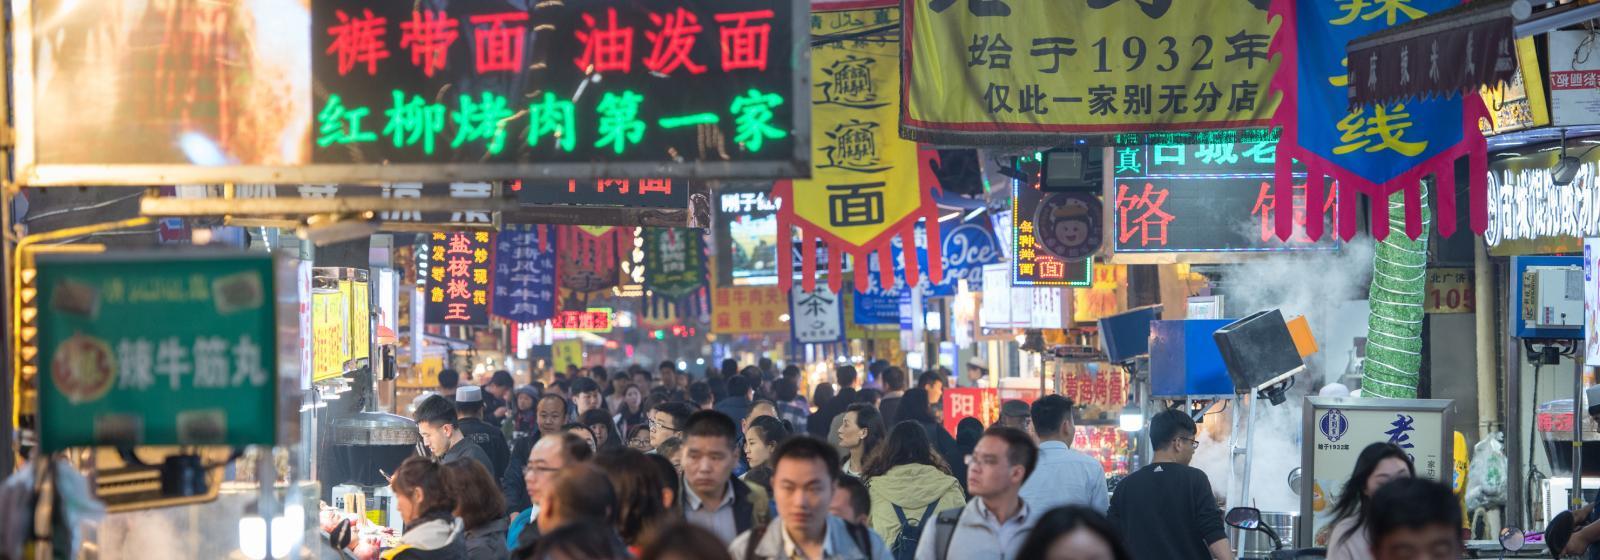 Aktivitäten in Xian